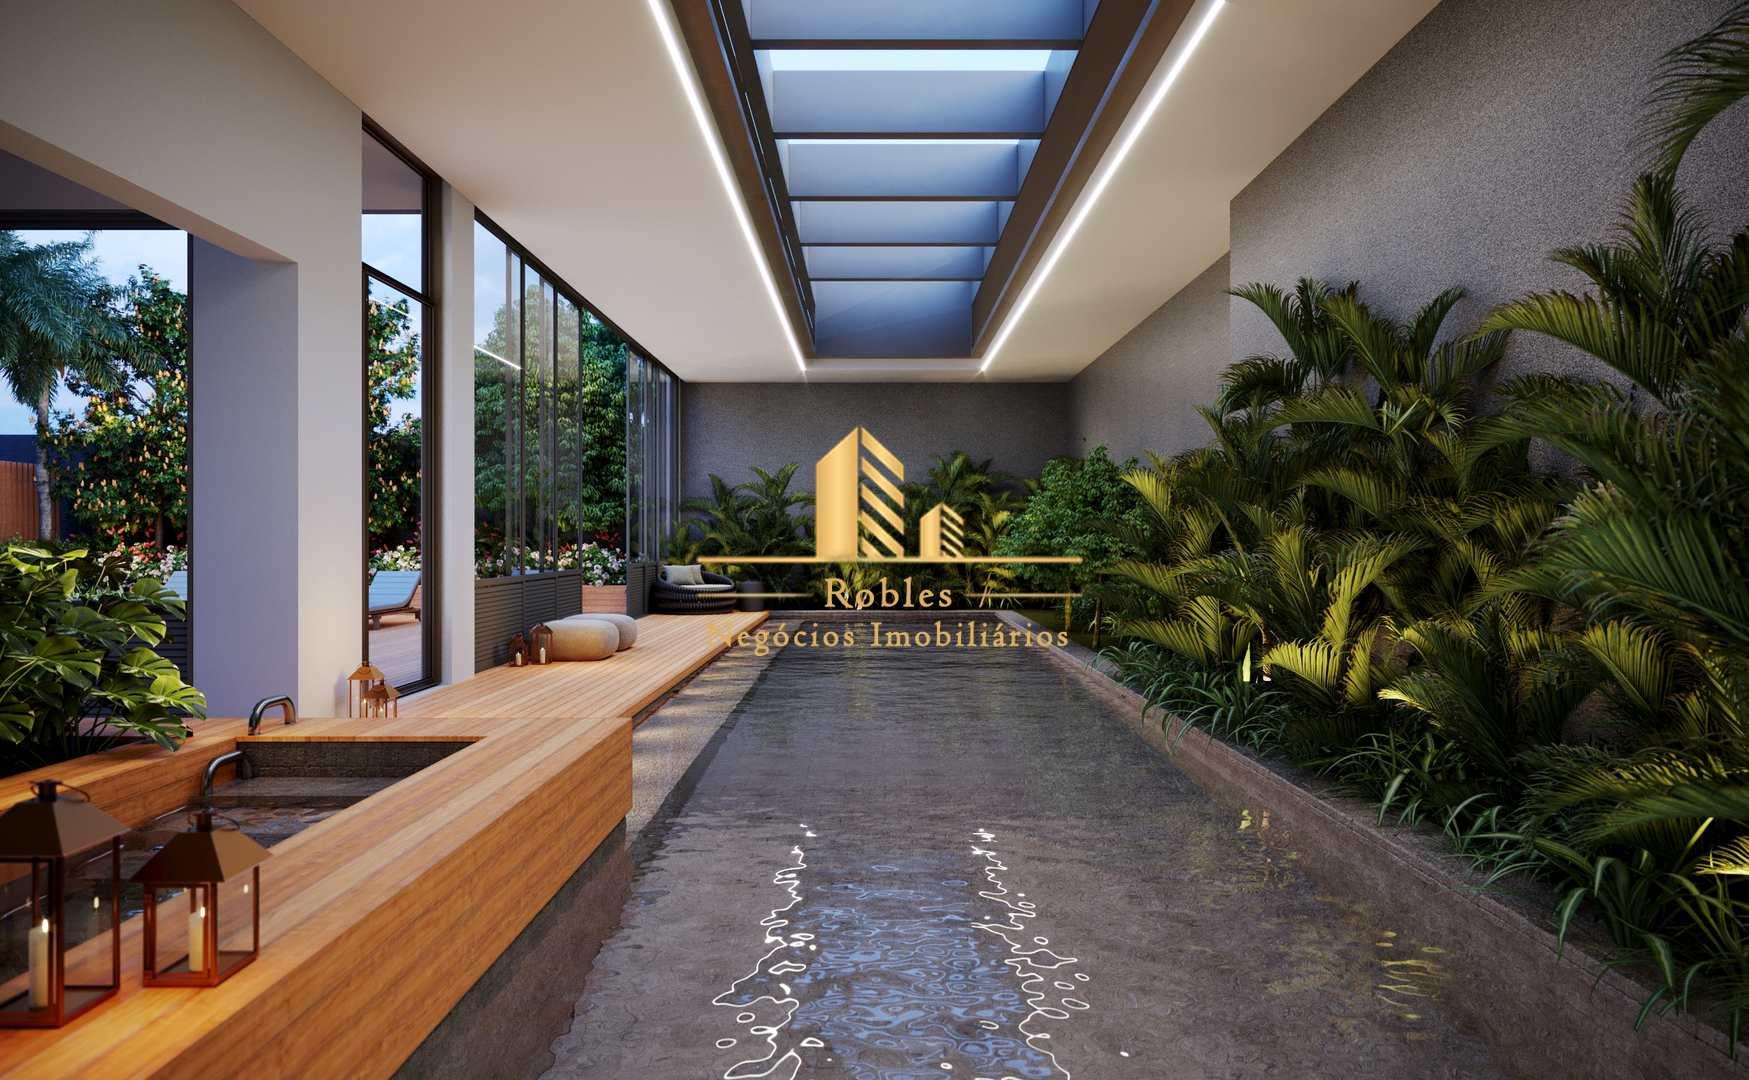 Apartamento com 3 dorms, Ibirapuera, São Paulo - R$ 10.7 mi, Cod: 1766